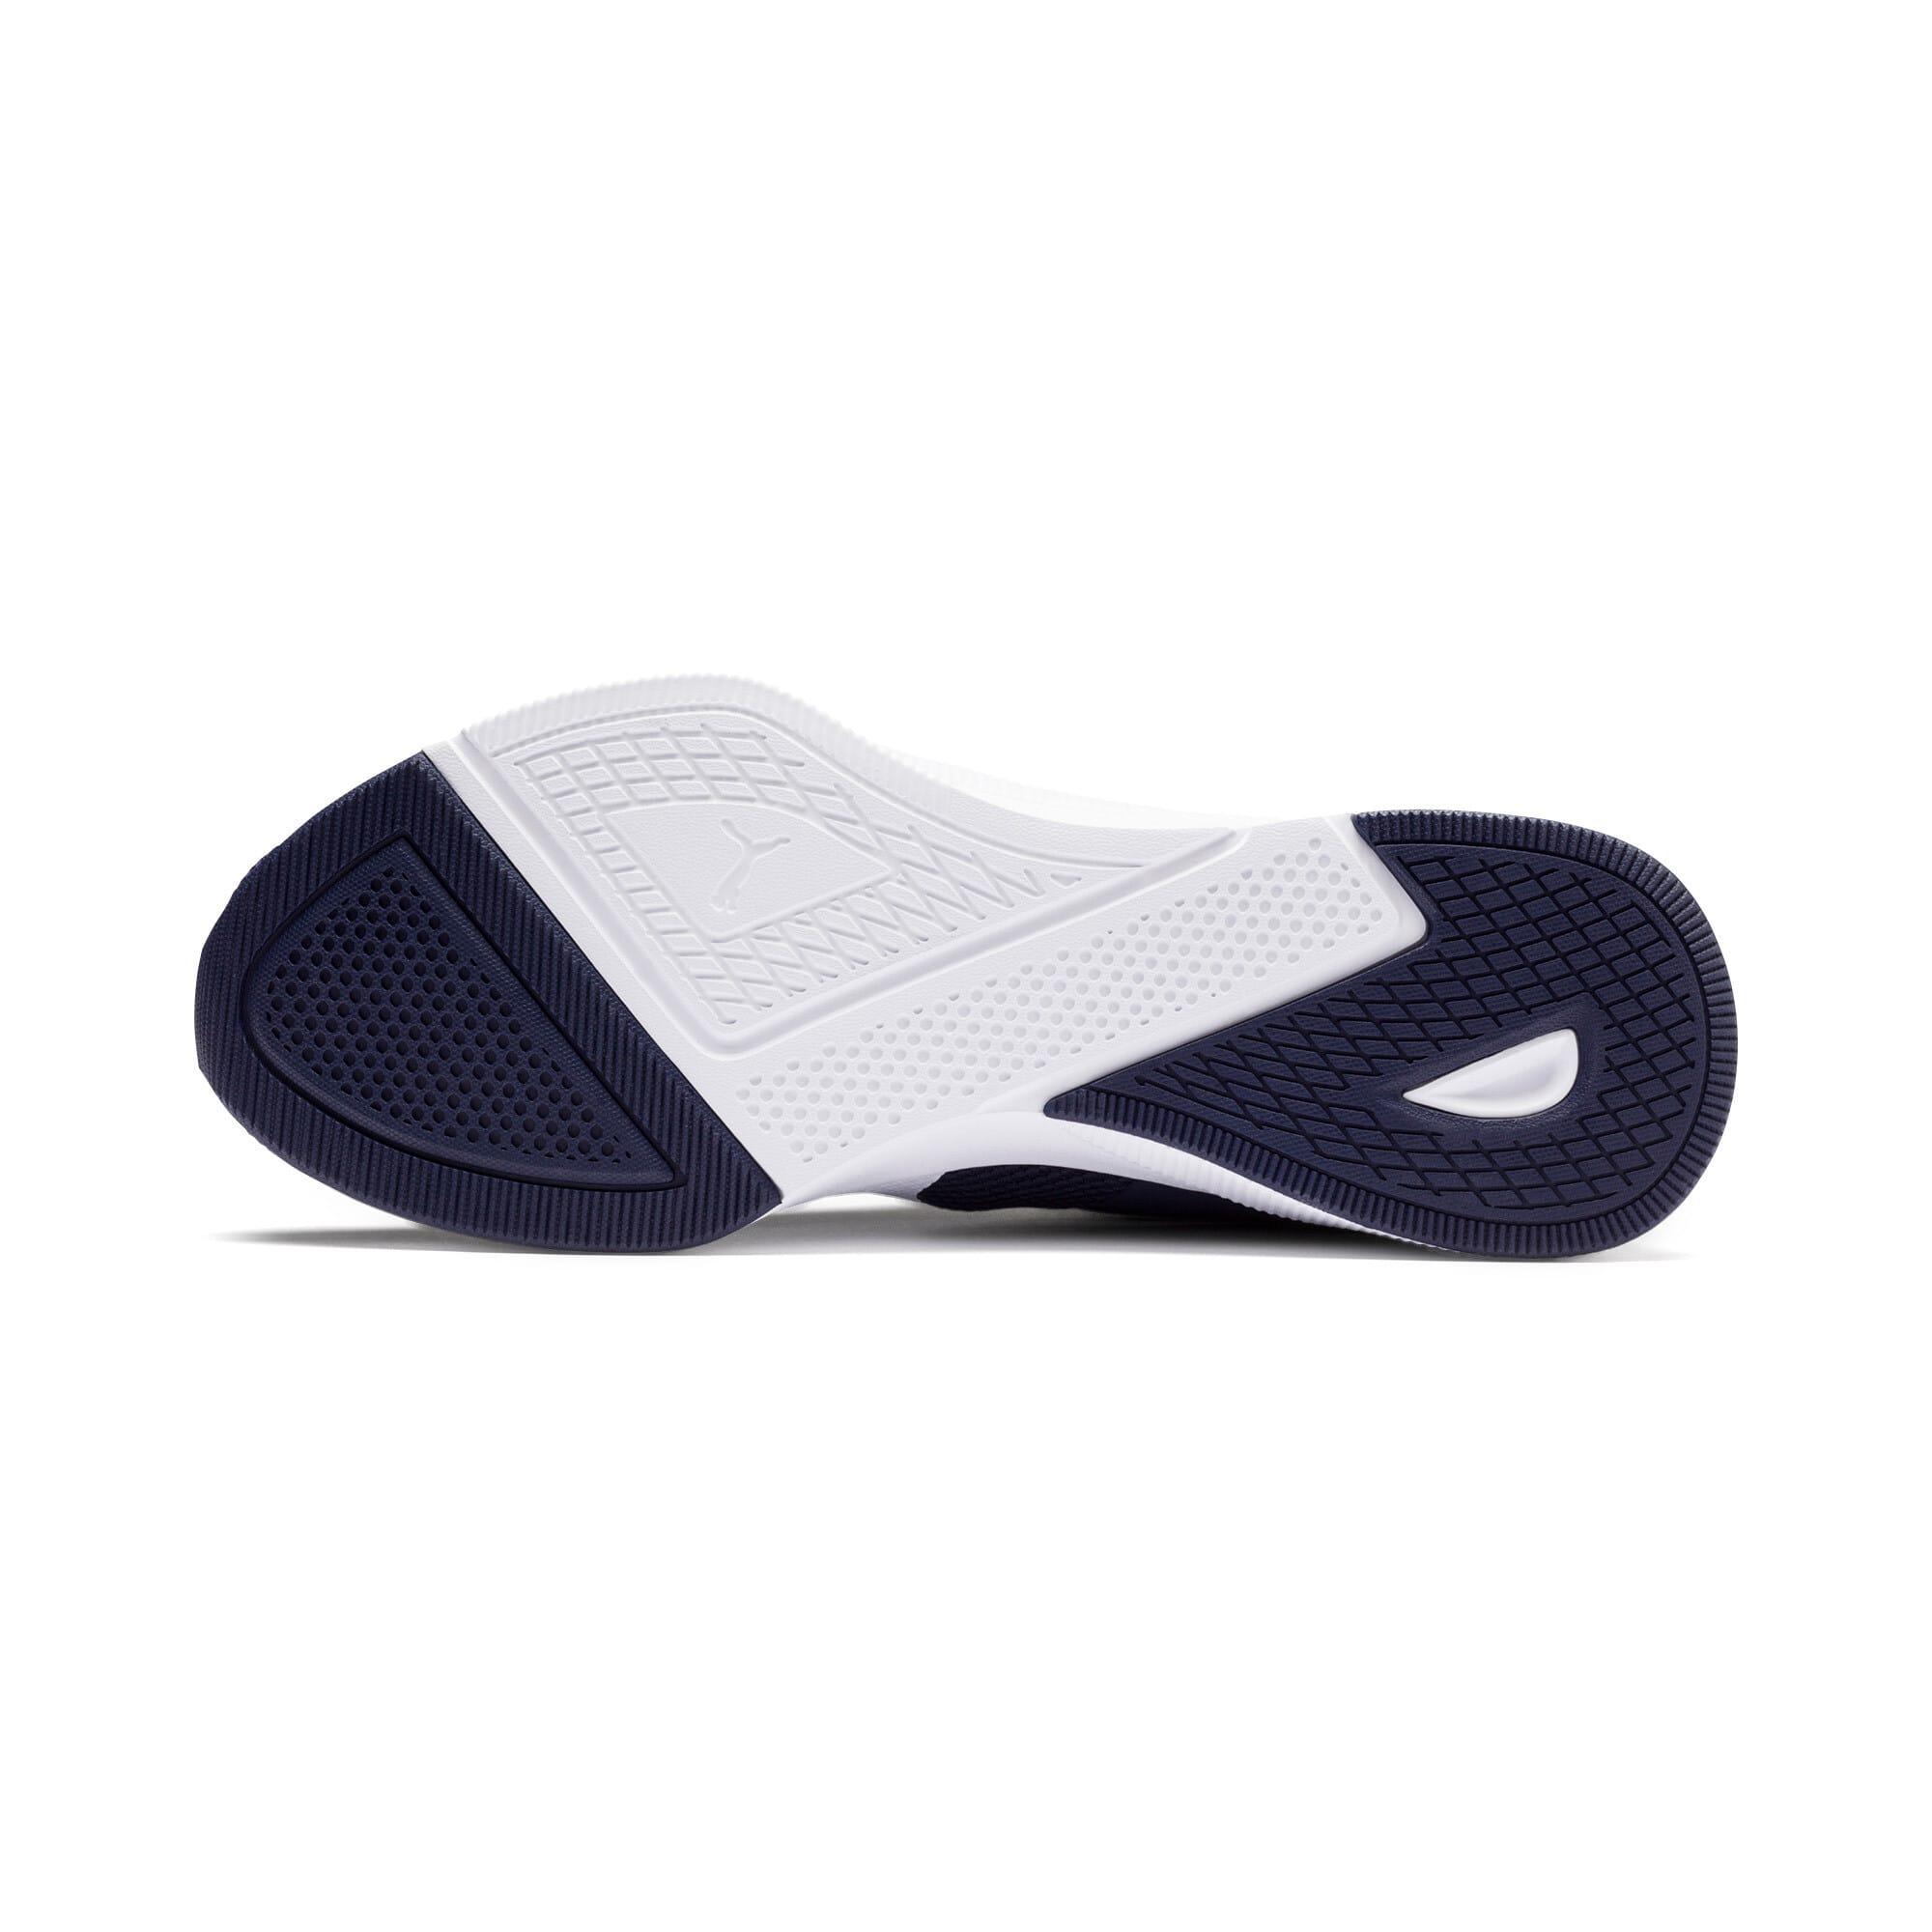 Thumbnail 4 of Flyer Runner Running Shoes, Peacoat-Puma White, medium